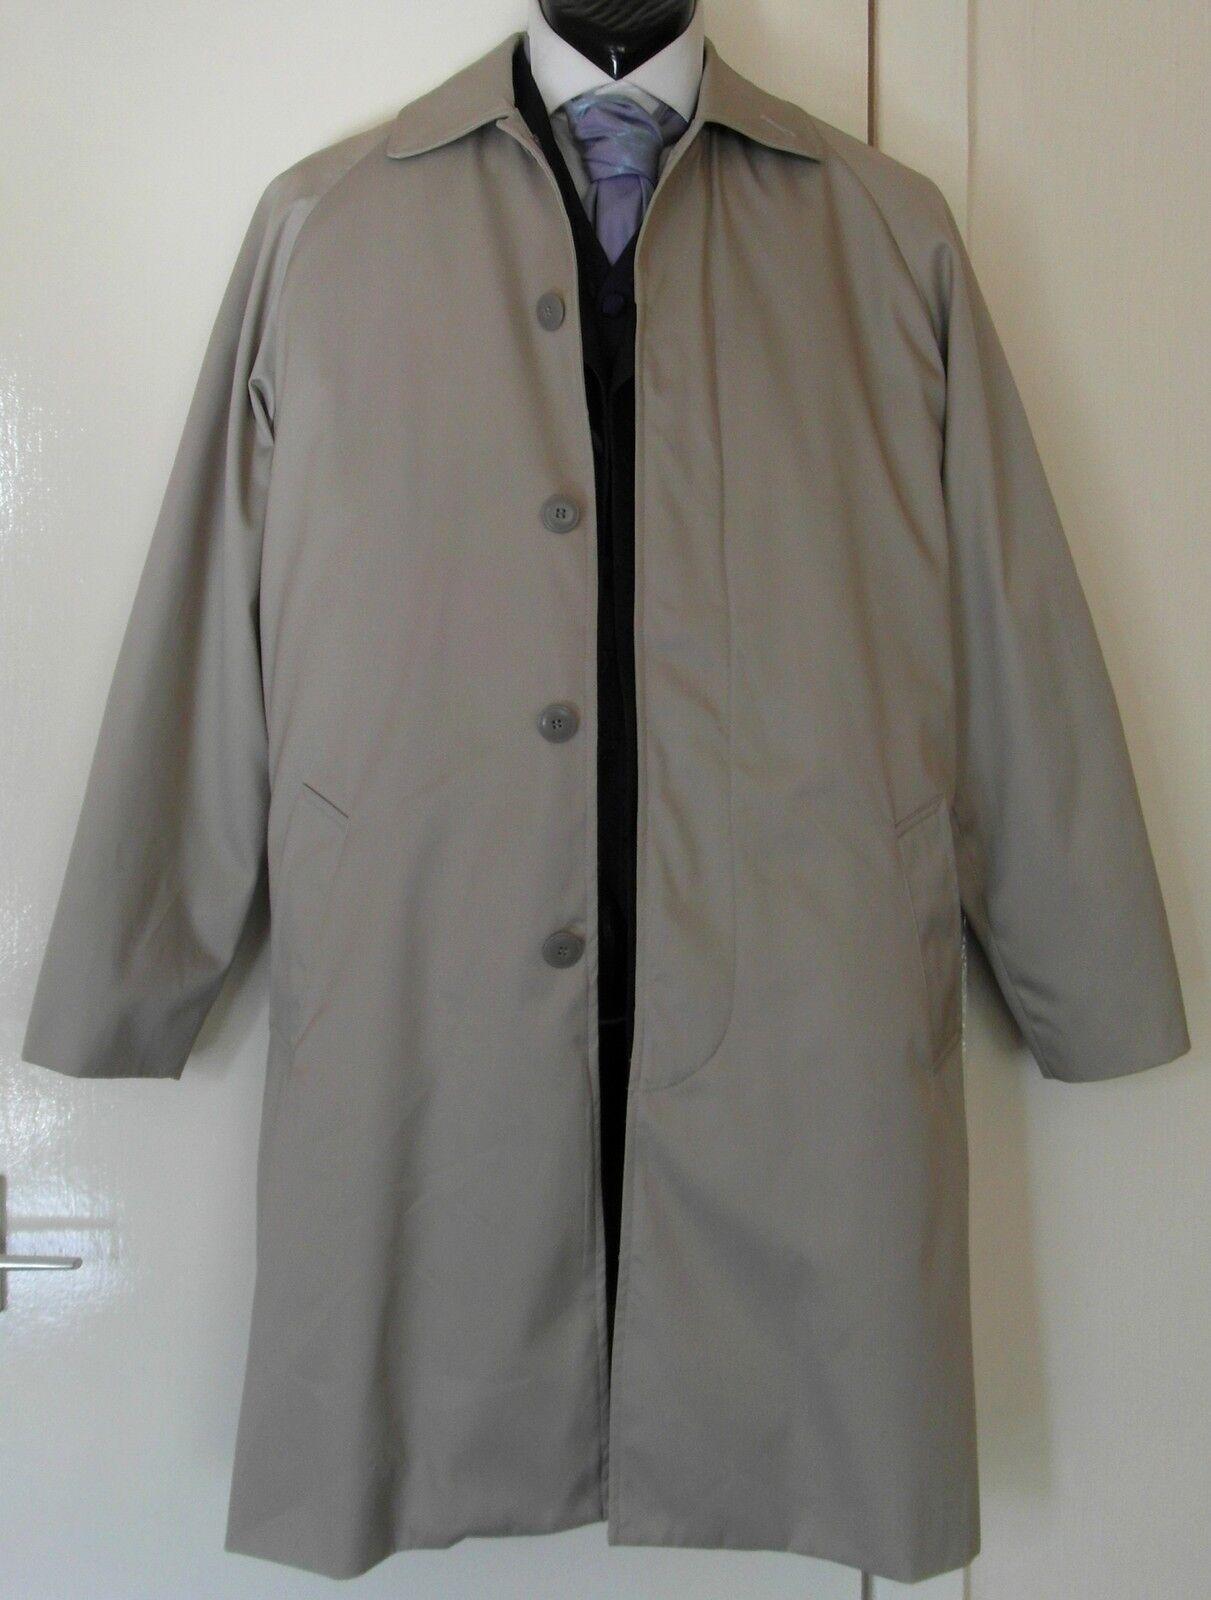 Luigi Lazzari Gents Beige Raincoat with Detachable Inner Waistcoat Size 36 NWOT